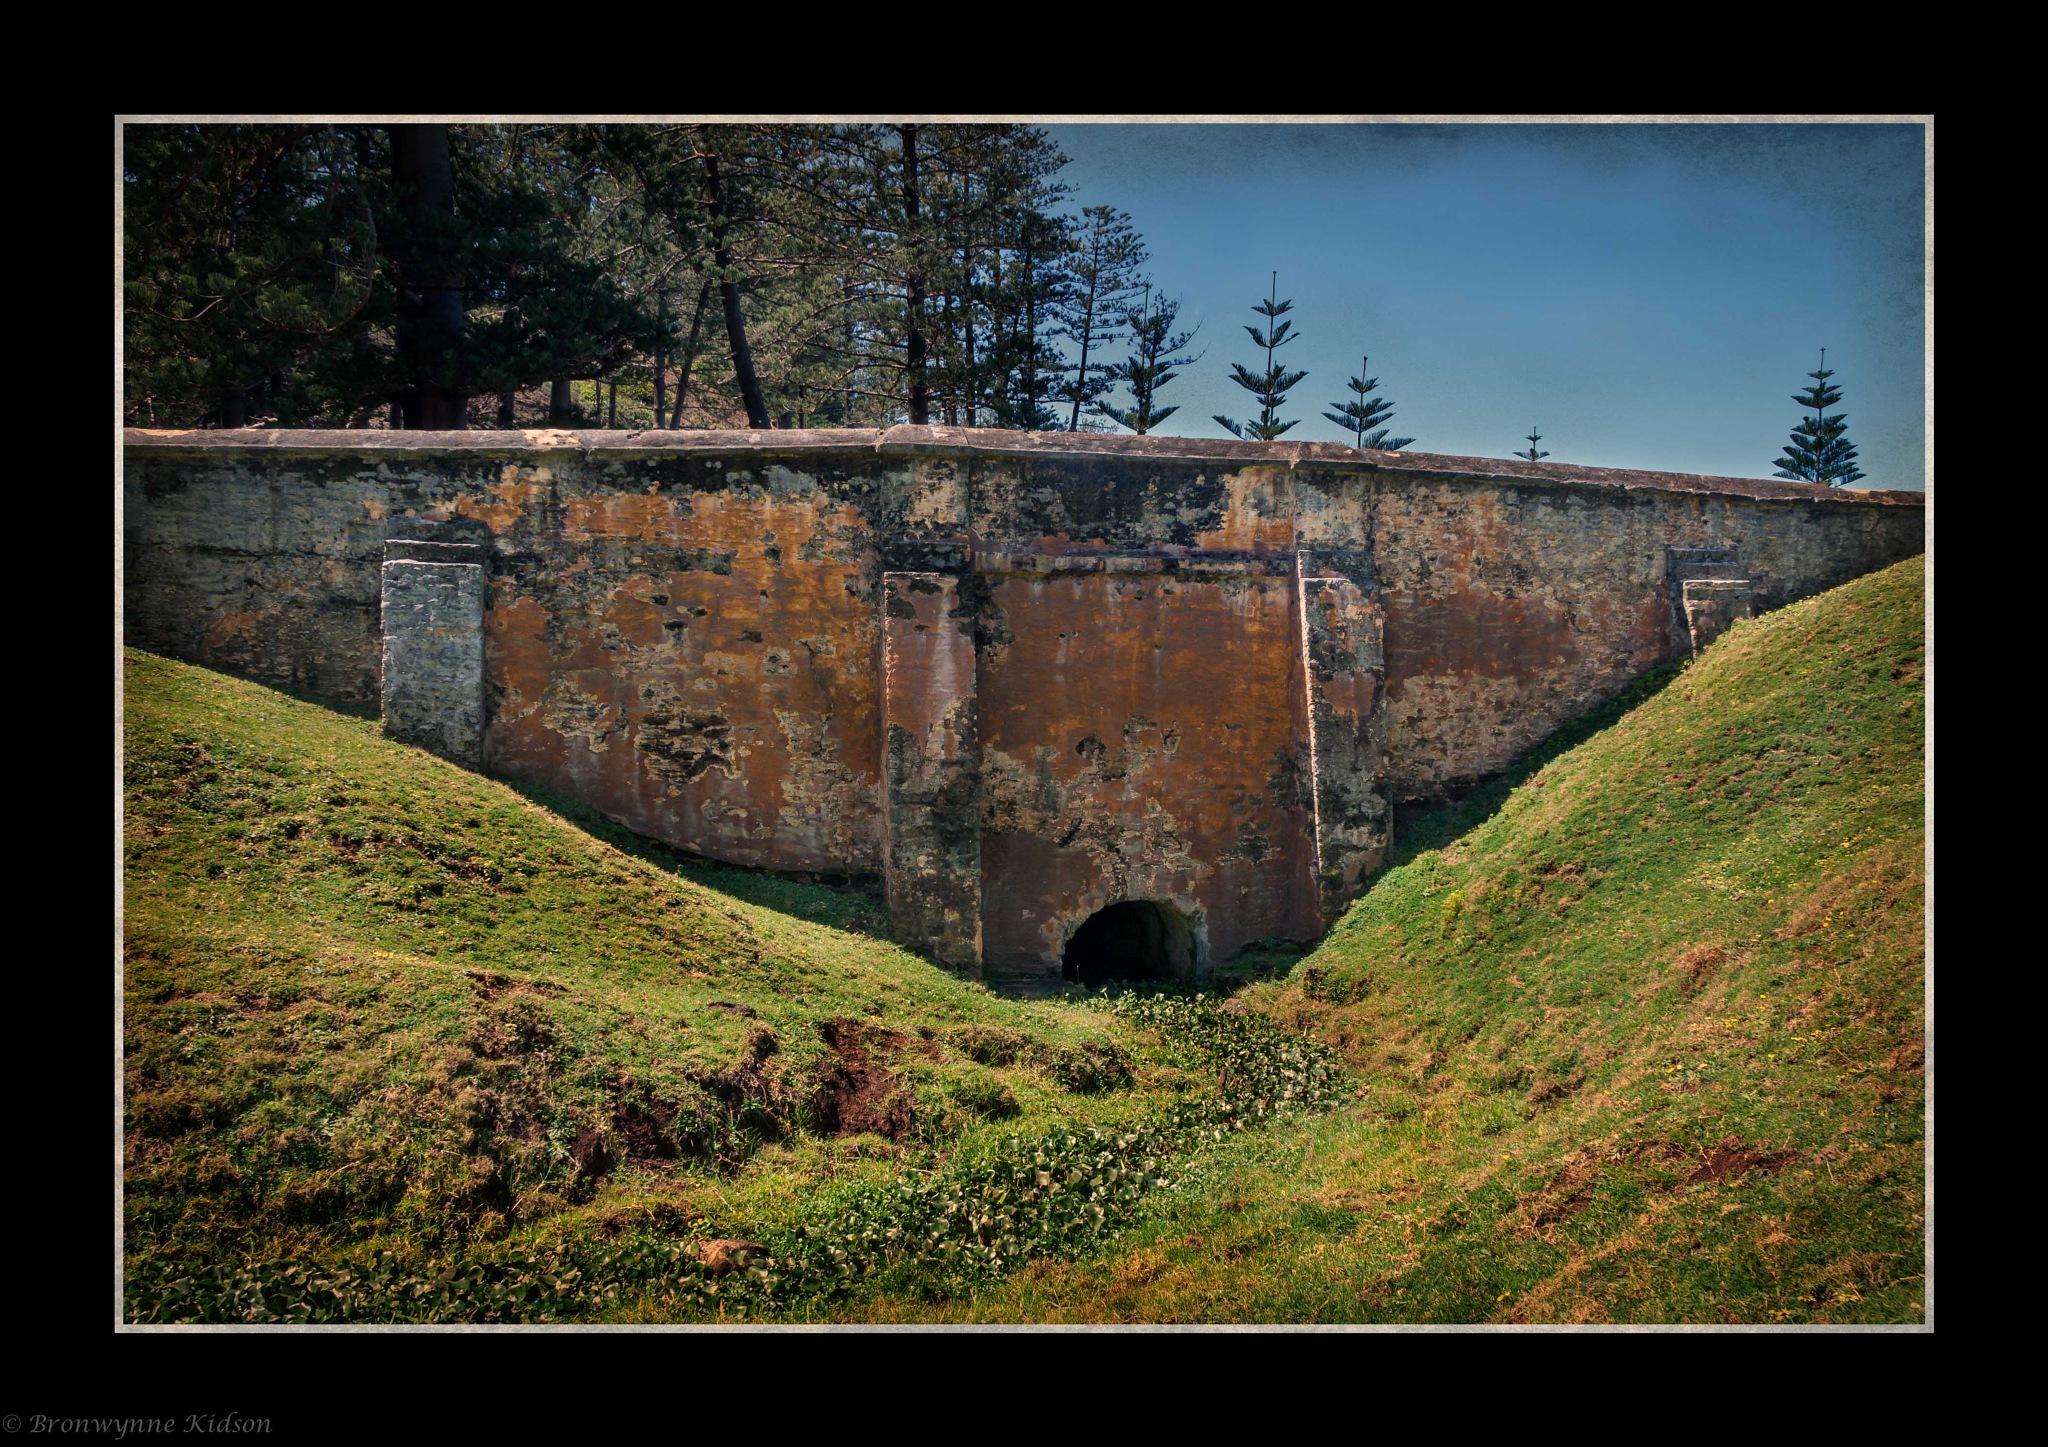 Bloody Bridge, Norfolk Island by Bronwynne Kidson